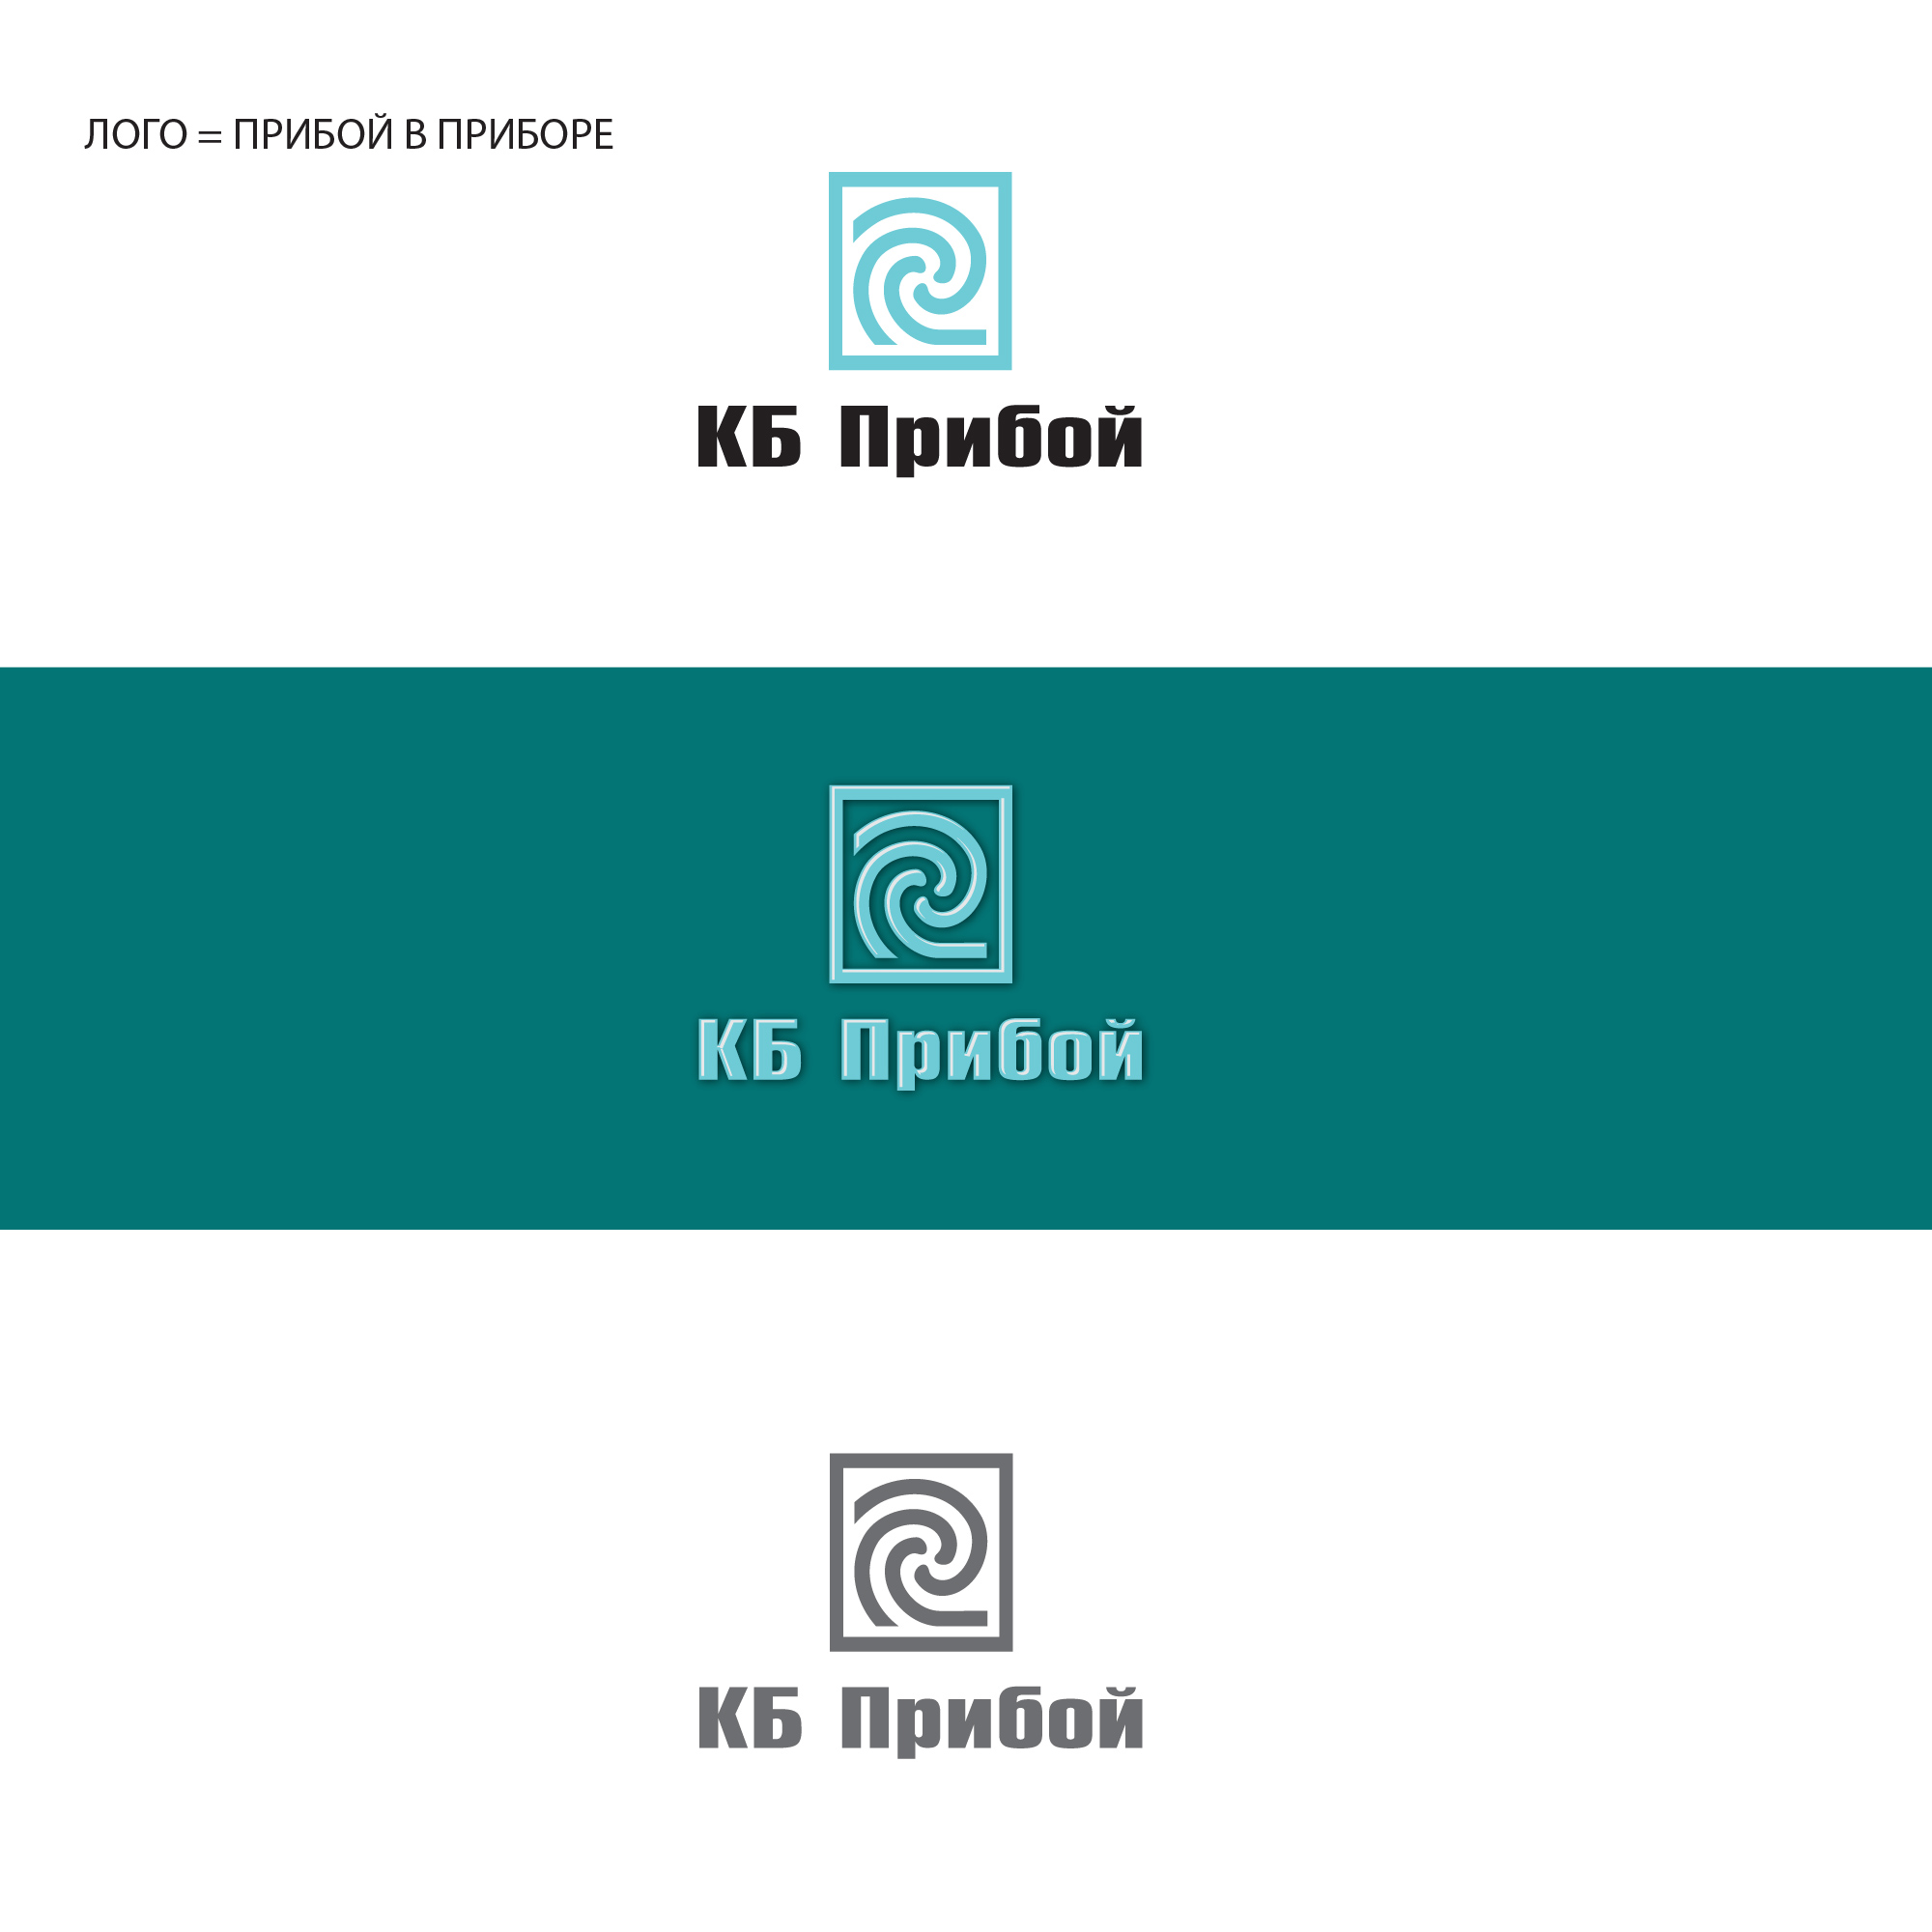 Разработка логотипа и фирменного стиля для КБ Прибой фото f_1005b2743c9ec7a1.jpg